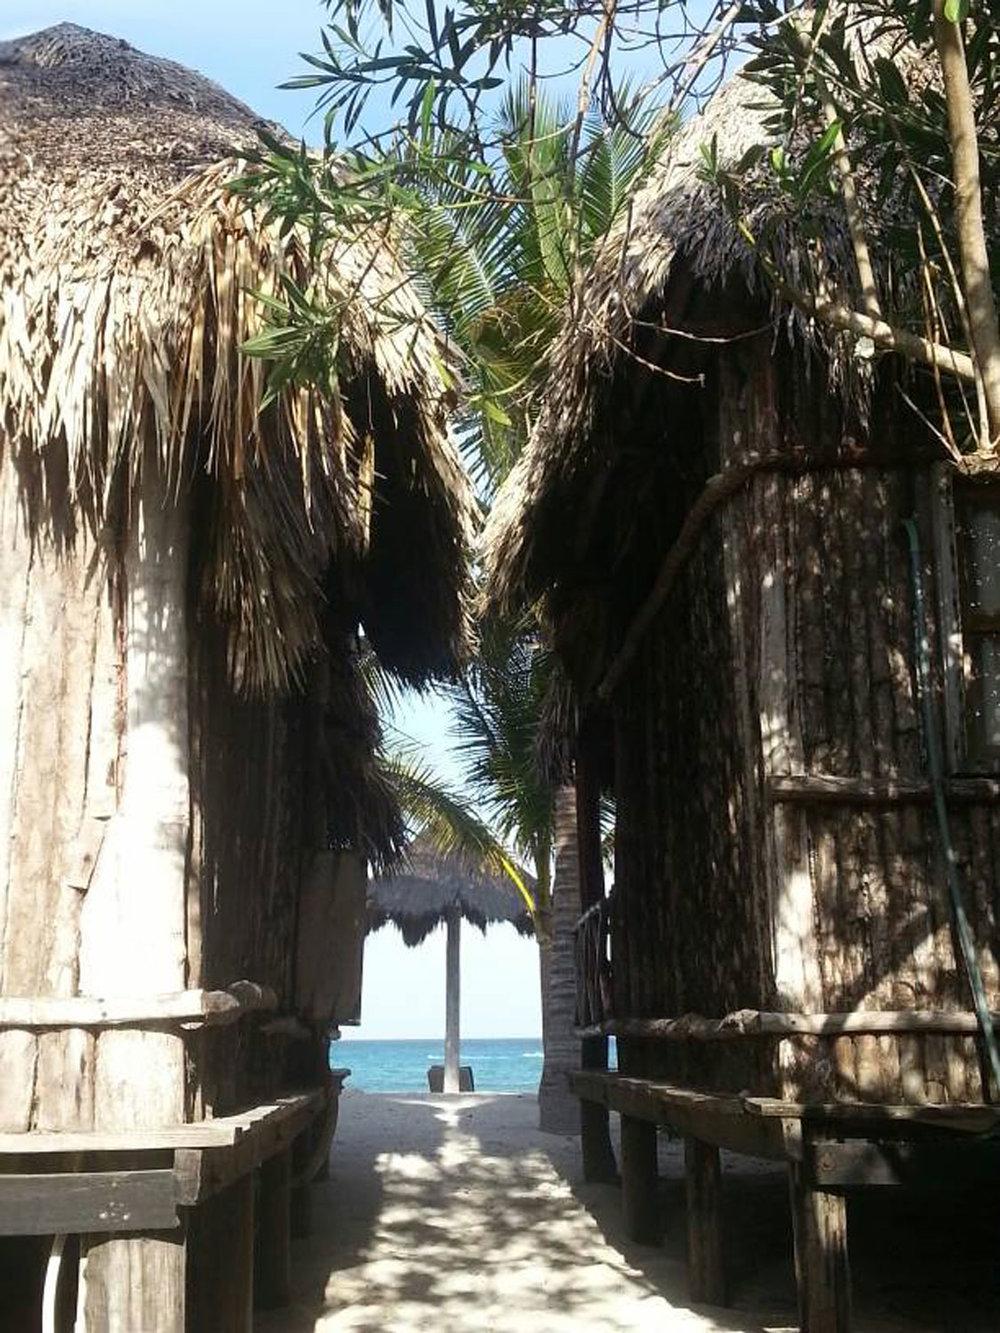 Hammocks_and_Ruins_Riviera_Maya_Mexico_Explore_What_to_Do_Yucatan_Playa_del_Carmen_Beahces_Paamul_7.jpg